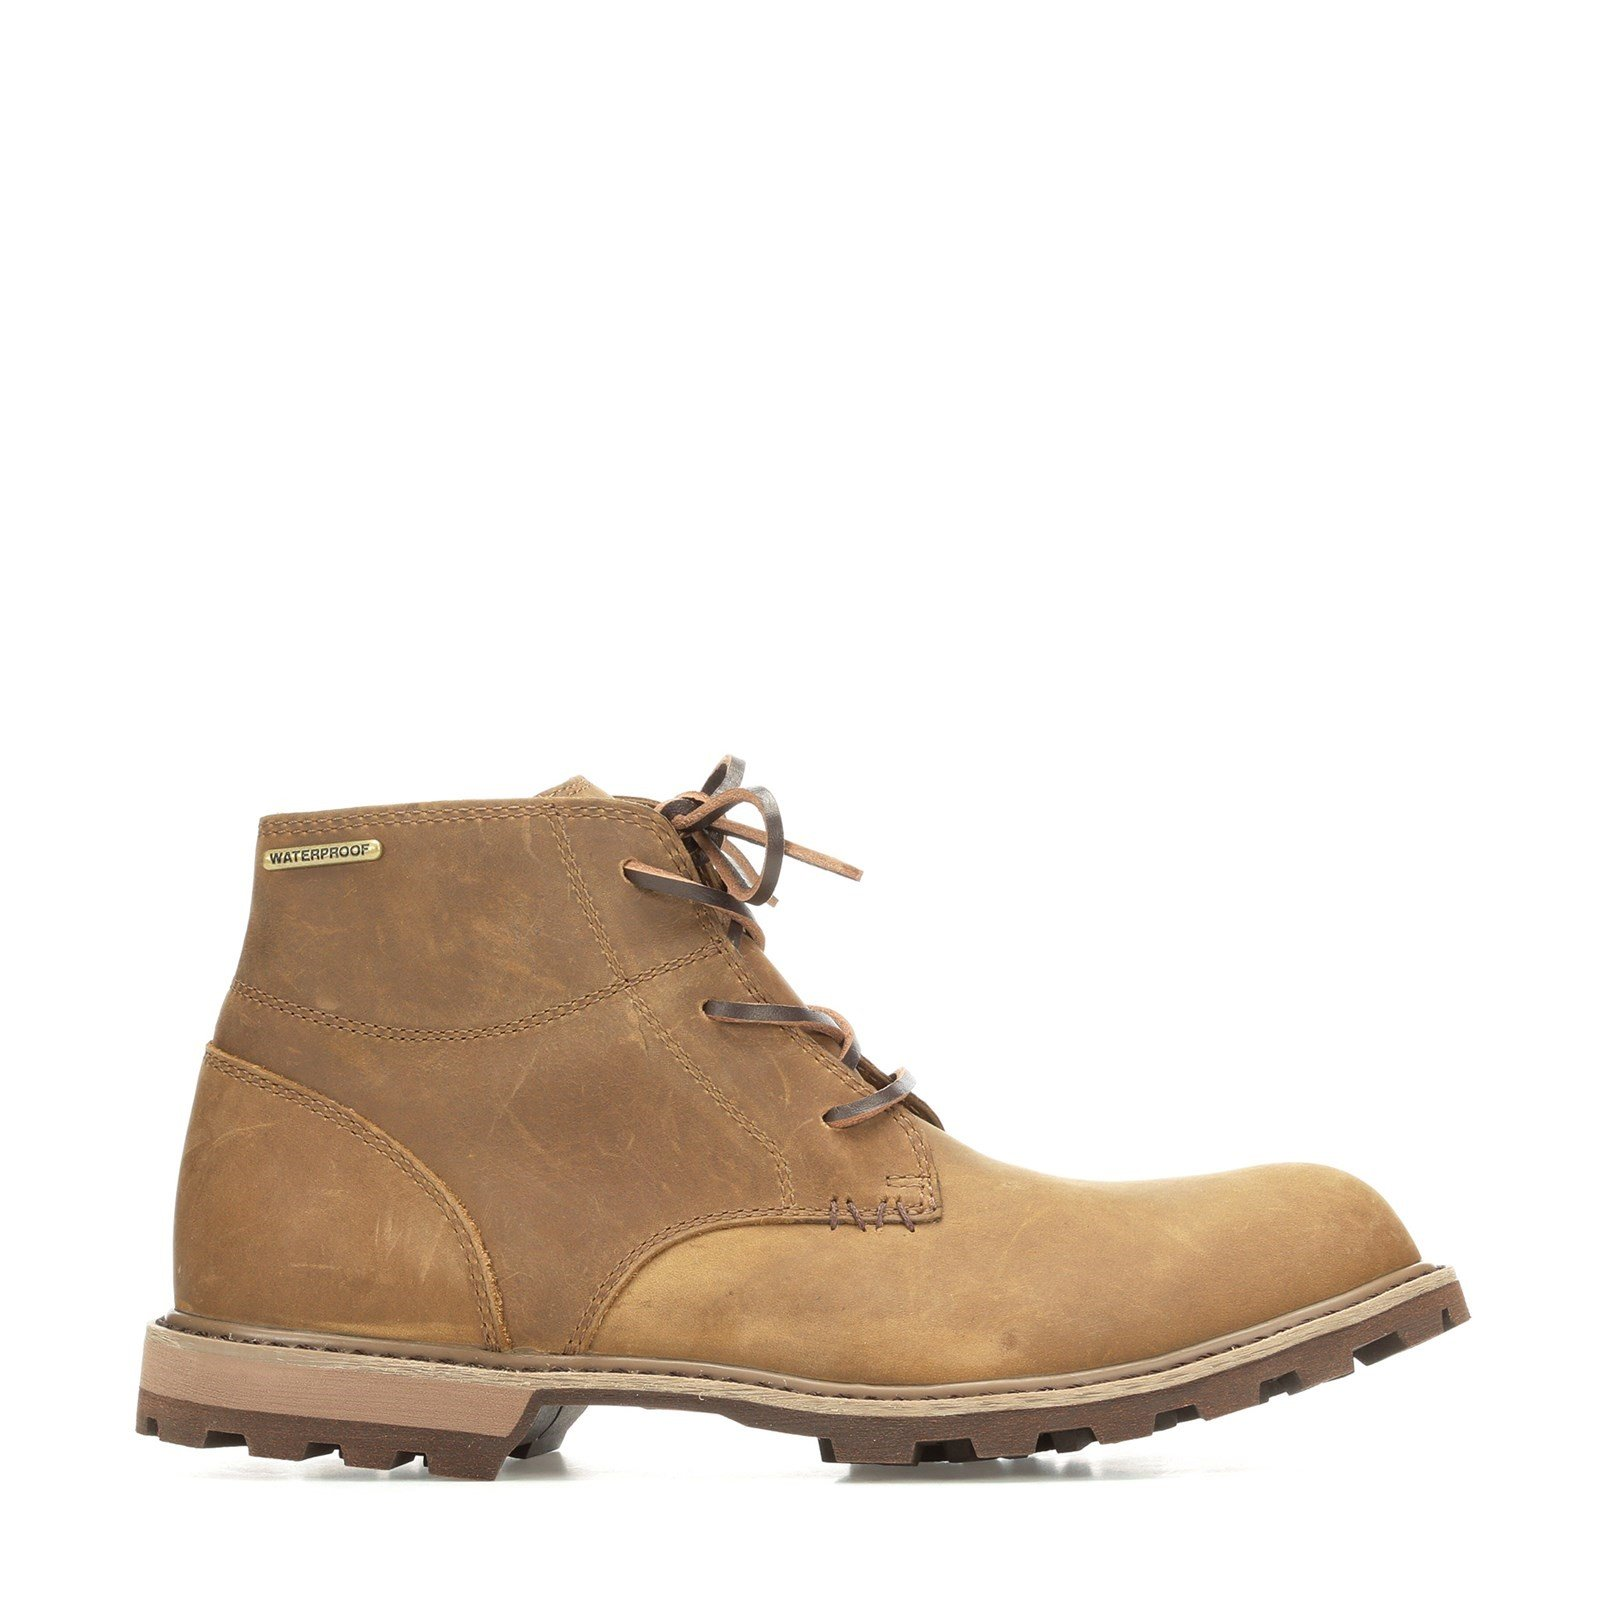 Muck Boots Men's Freeman Boot 31761 - Tan 8